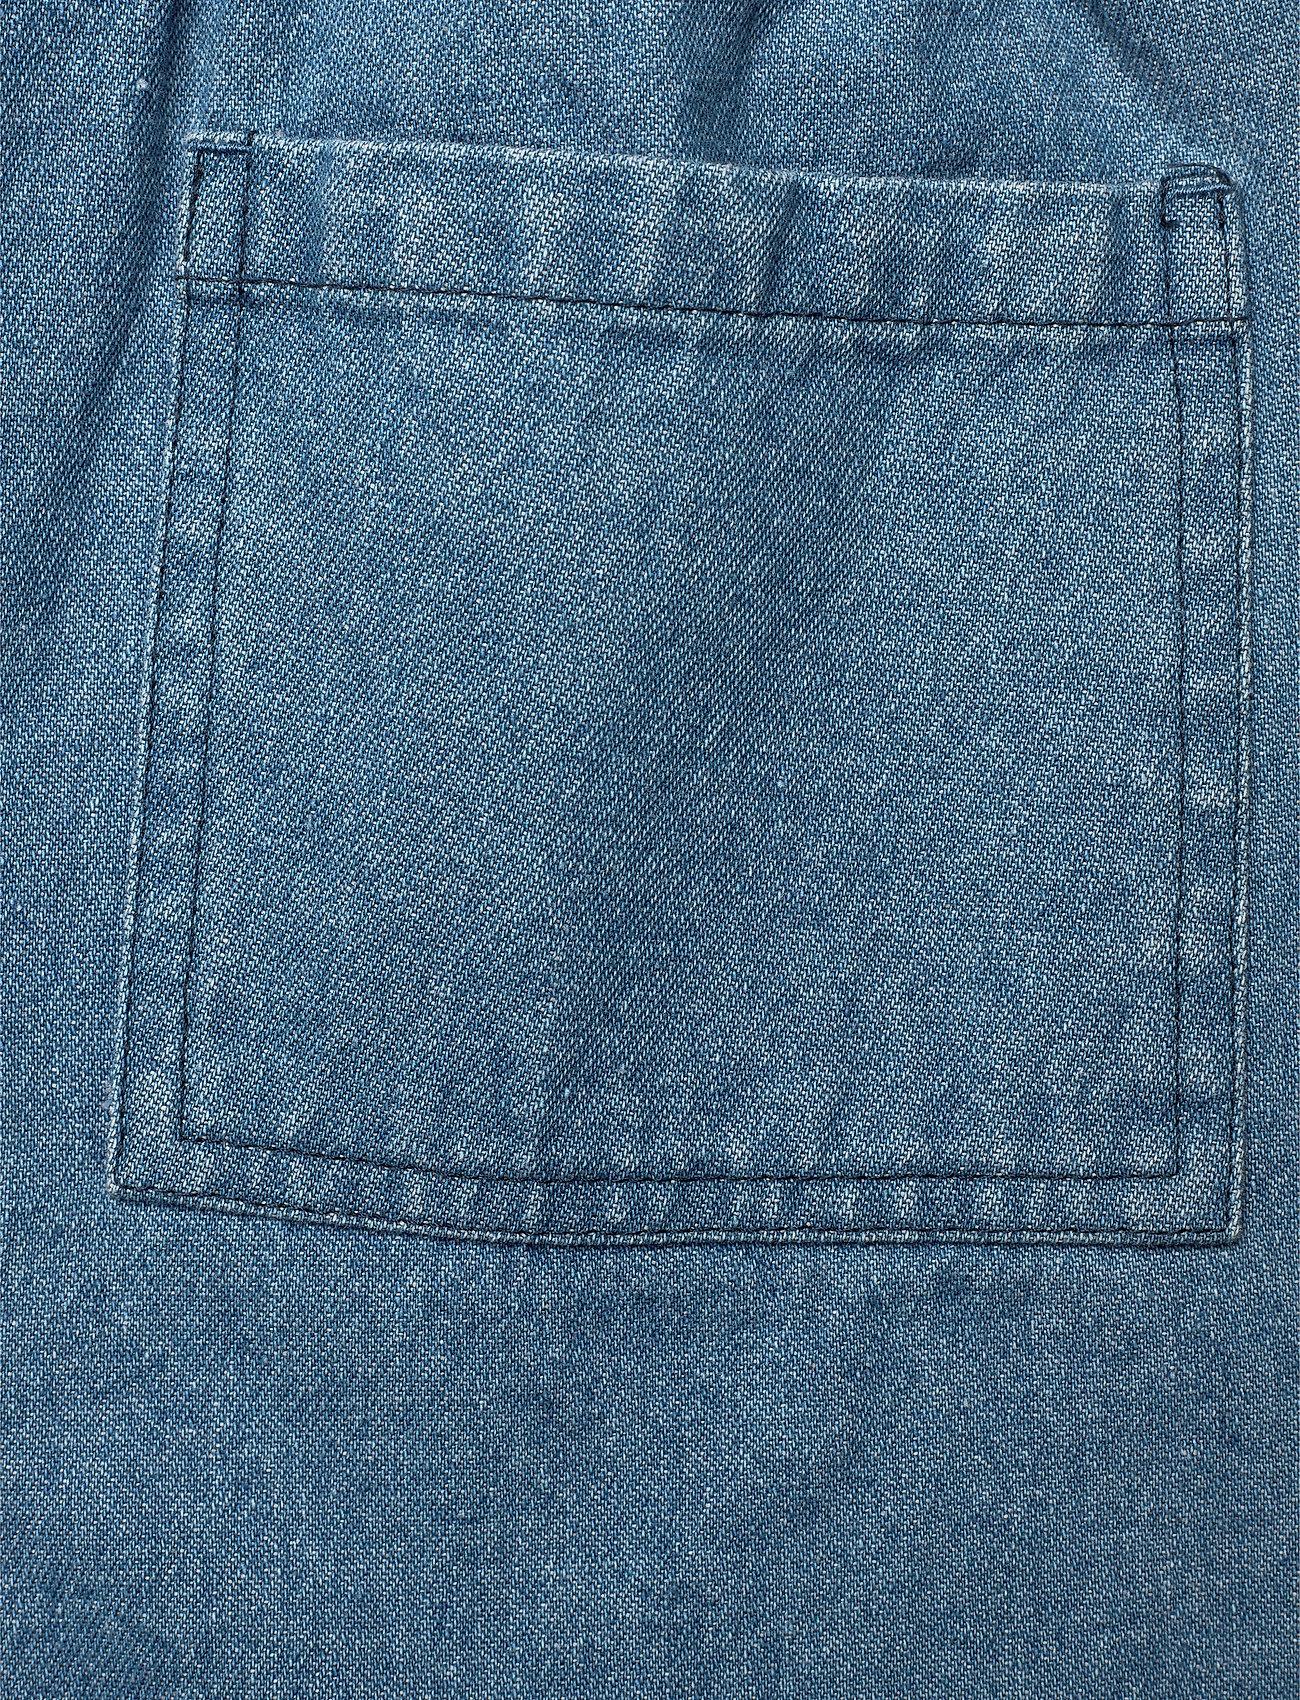 Alisdair Shorts (Denim Blue) (16.49 €) - Soft Gallery uQUms